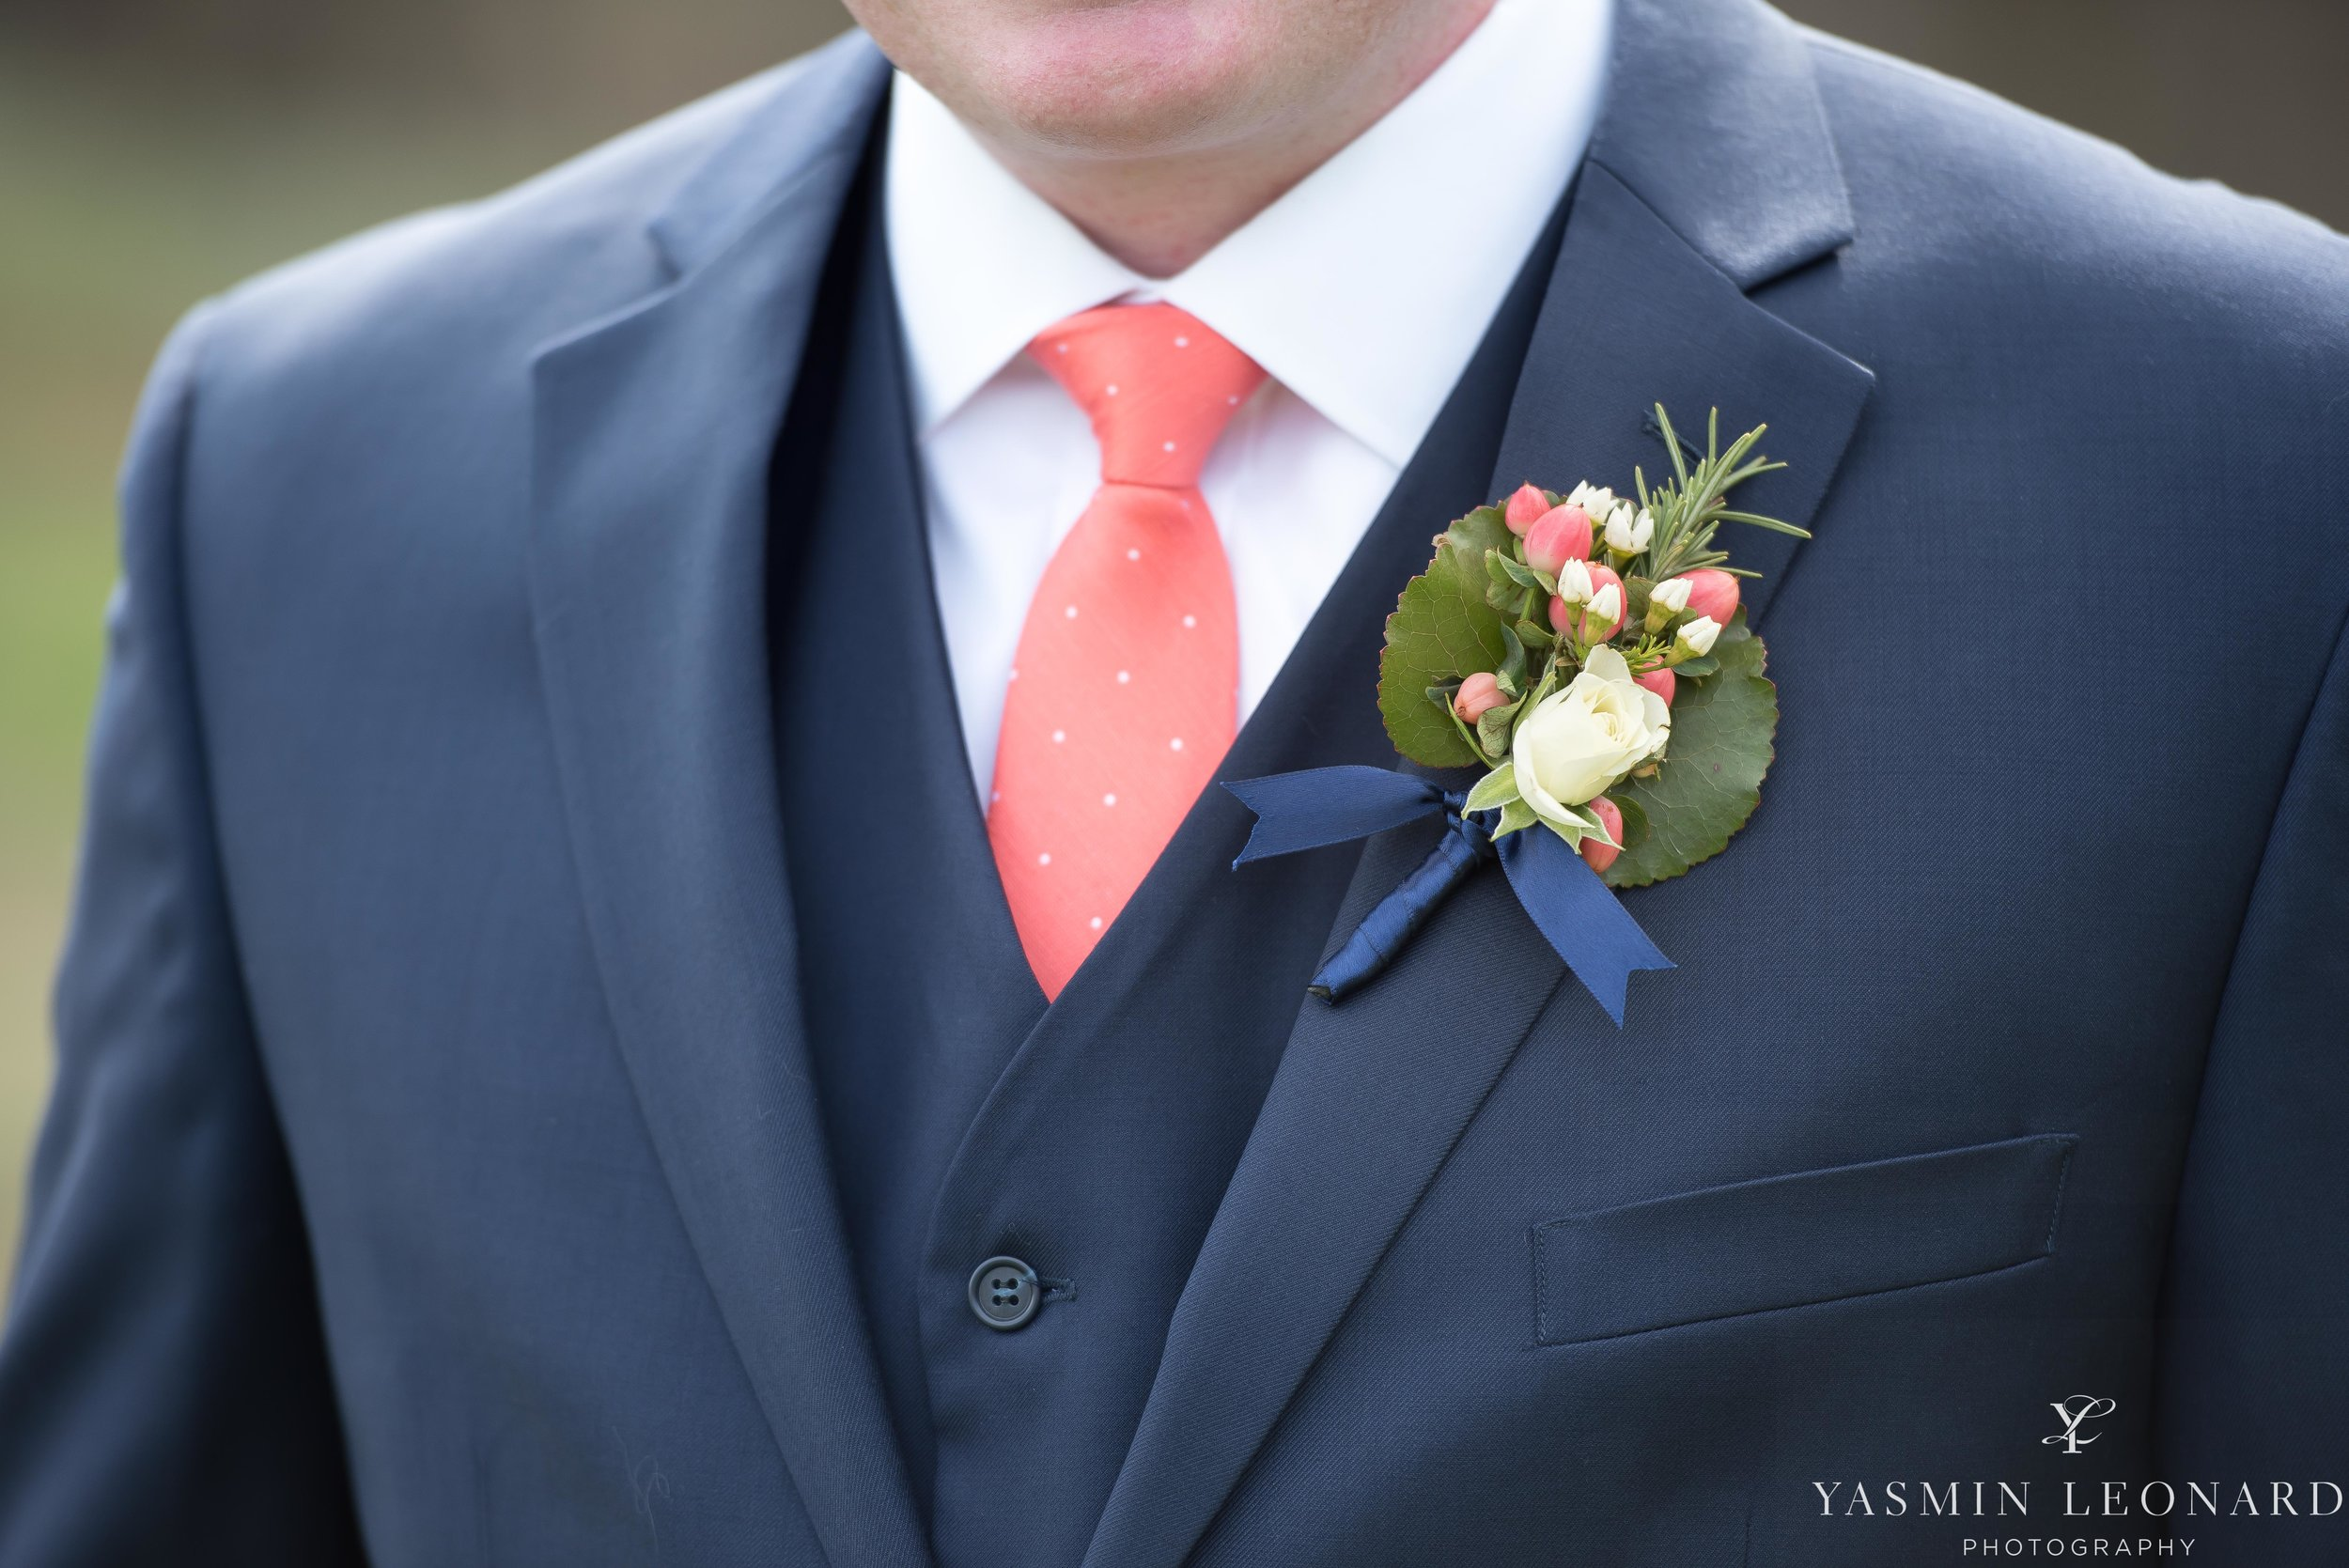 Adaumont Farm - Adaumont Farm Weddings - Trinity Weddings - NC Weddings - Yasmin Leonard Photography-16.jpg